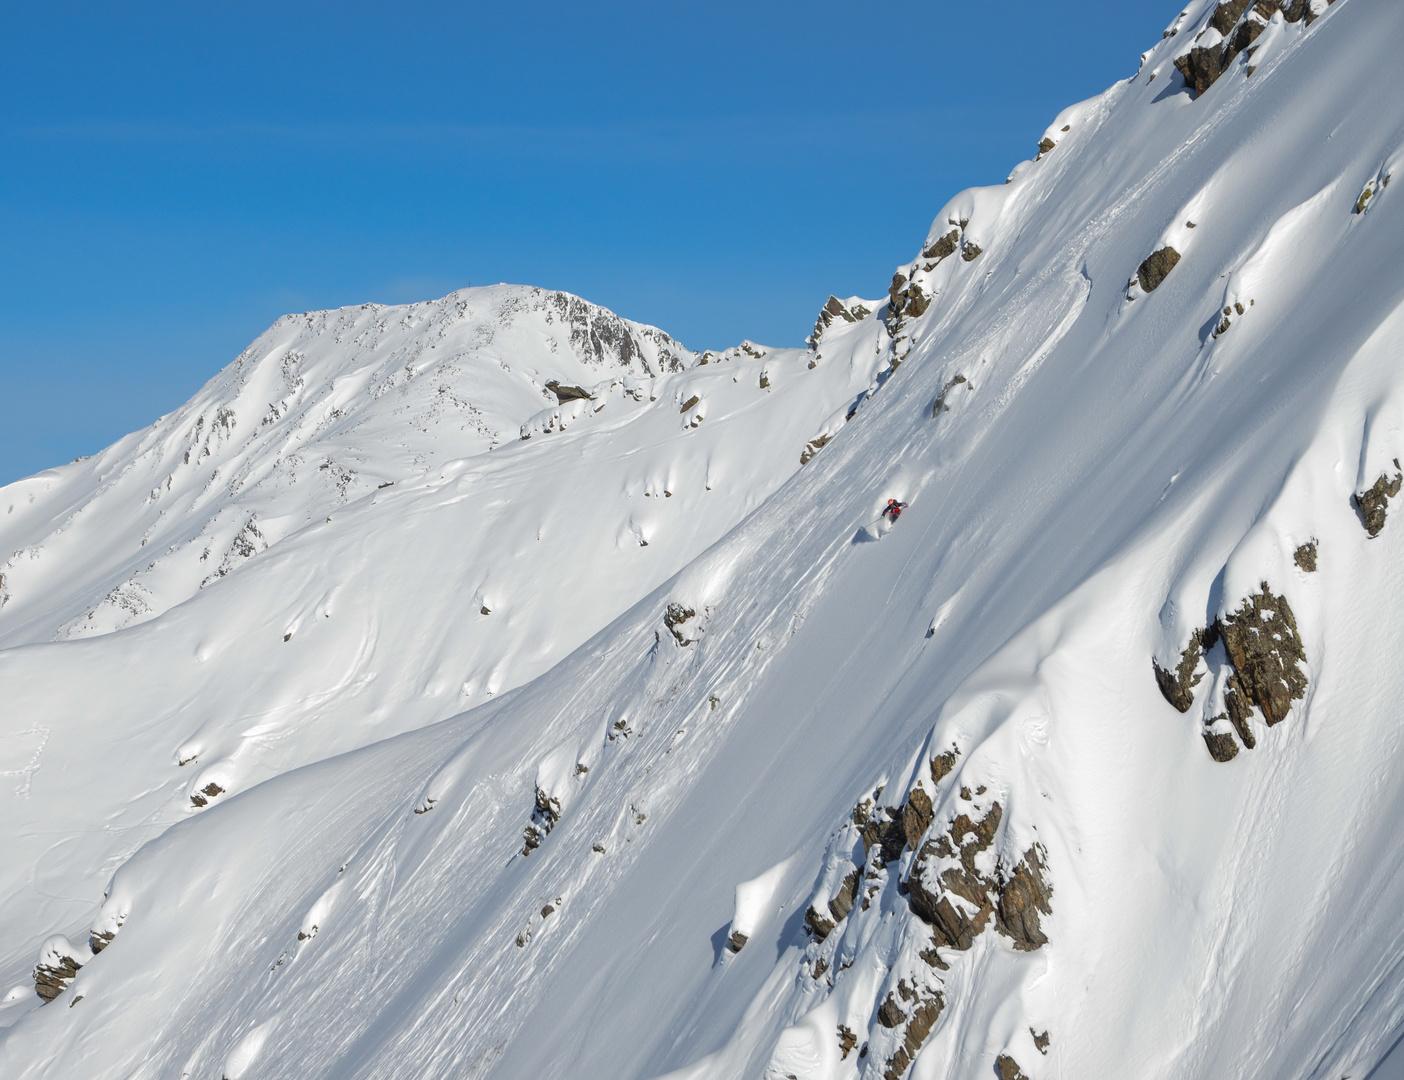 some steep n deep skiing